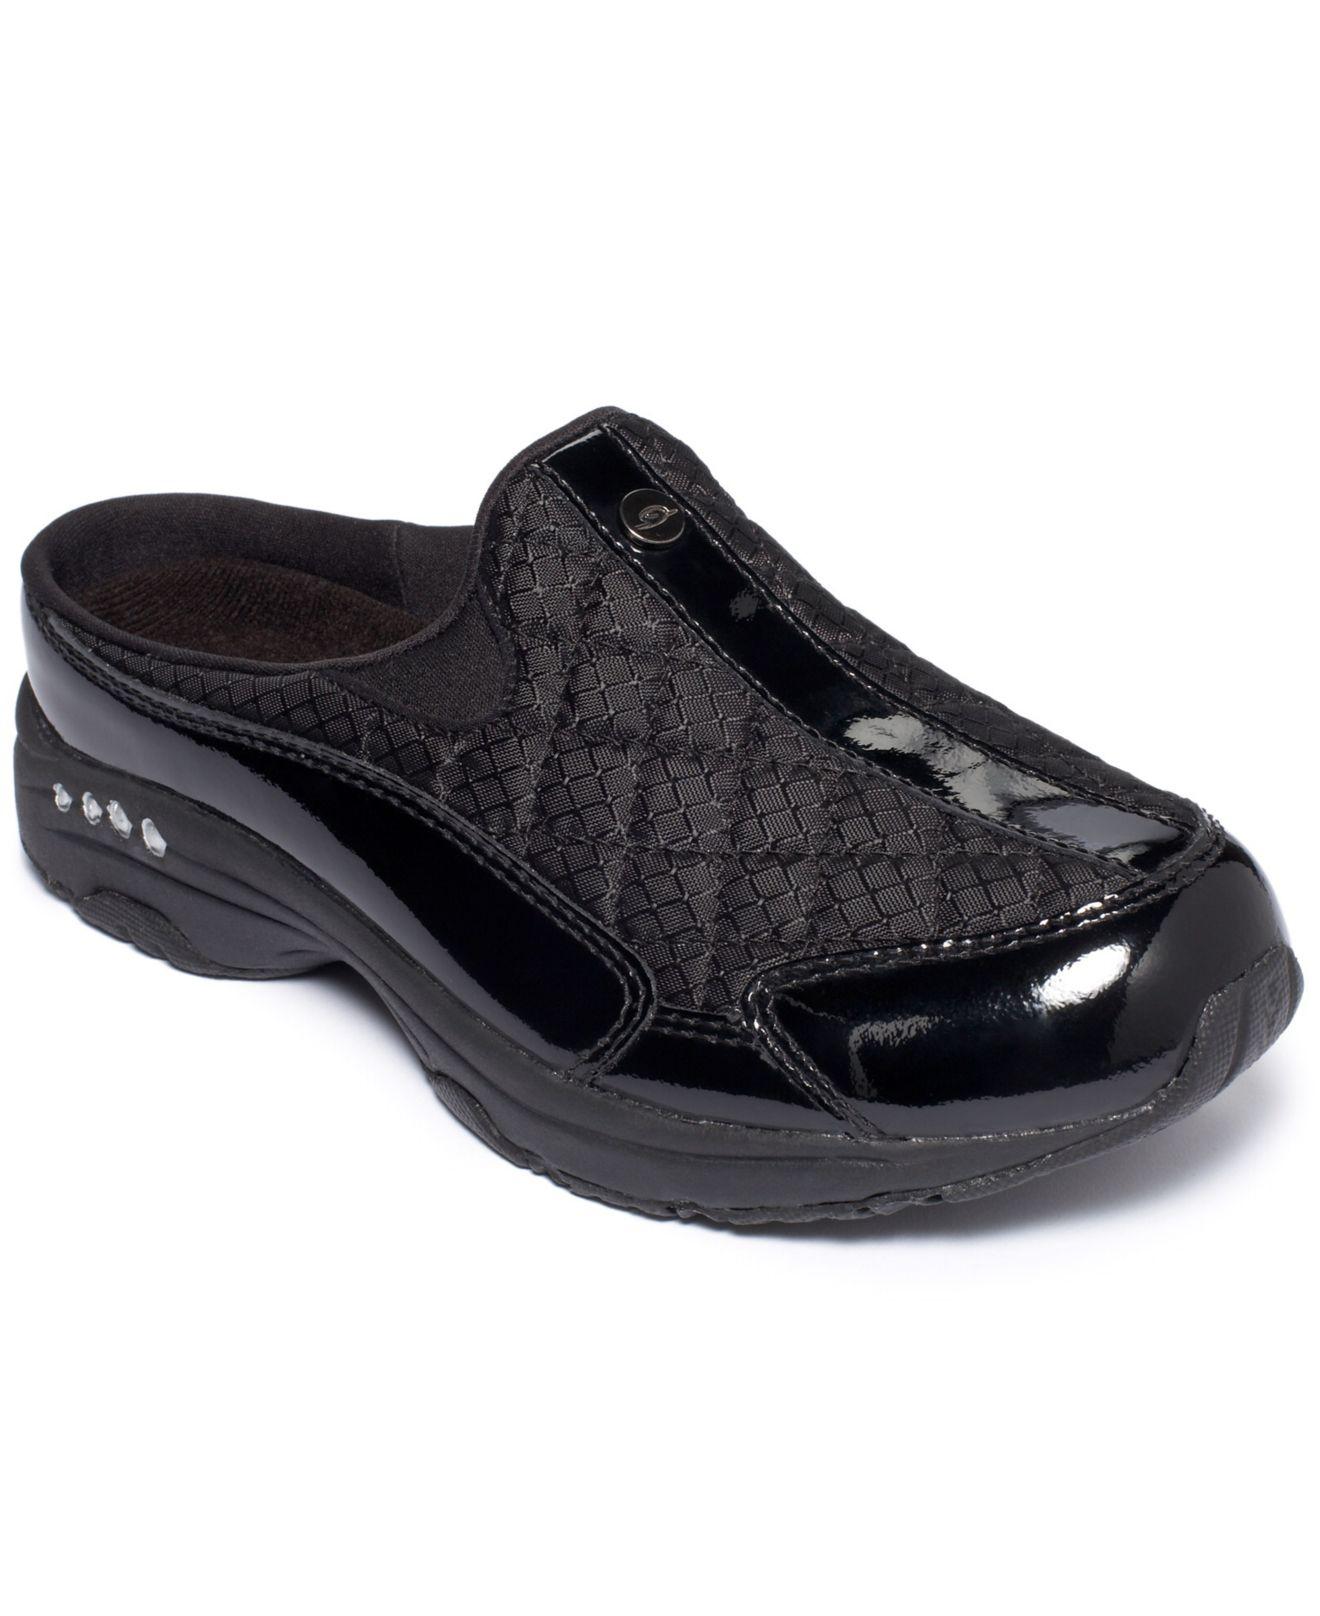 Easy Spirit Traveltime Sneakers In Black Save 15 Lyst